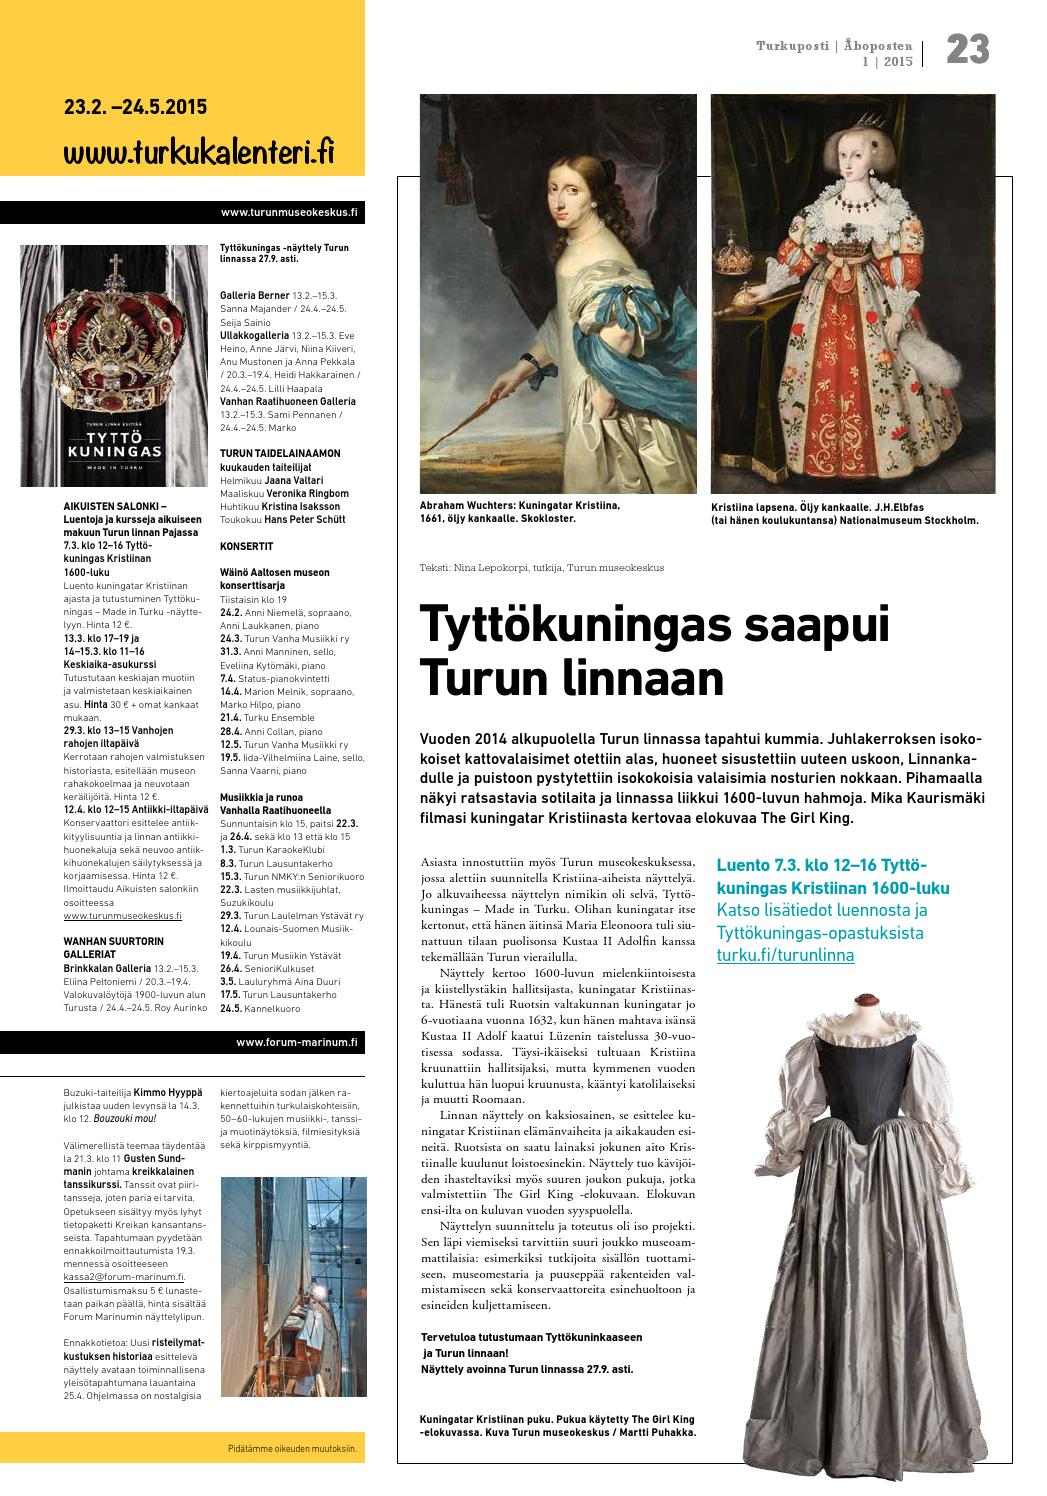 Turkukalenteri